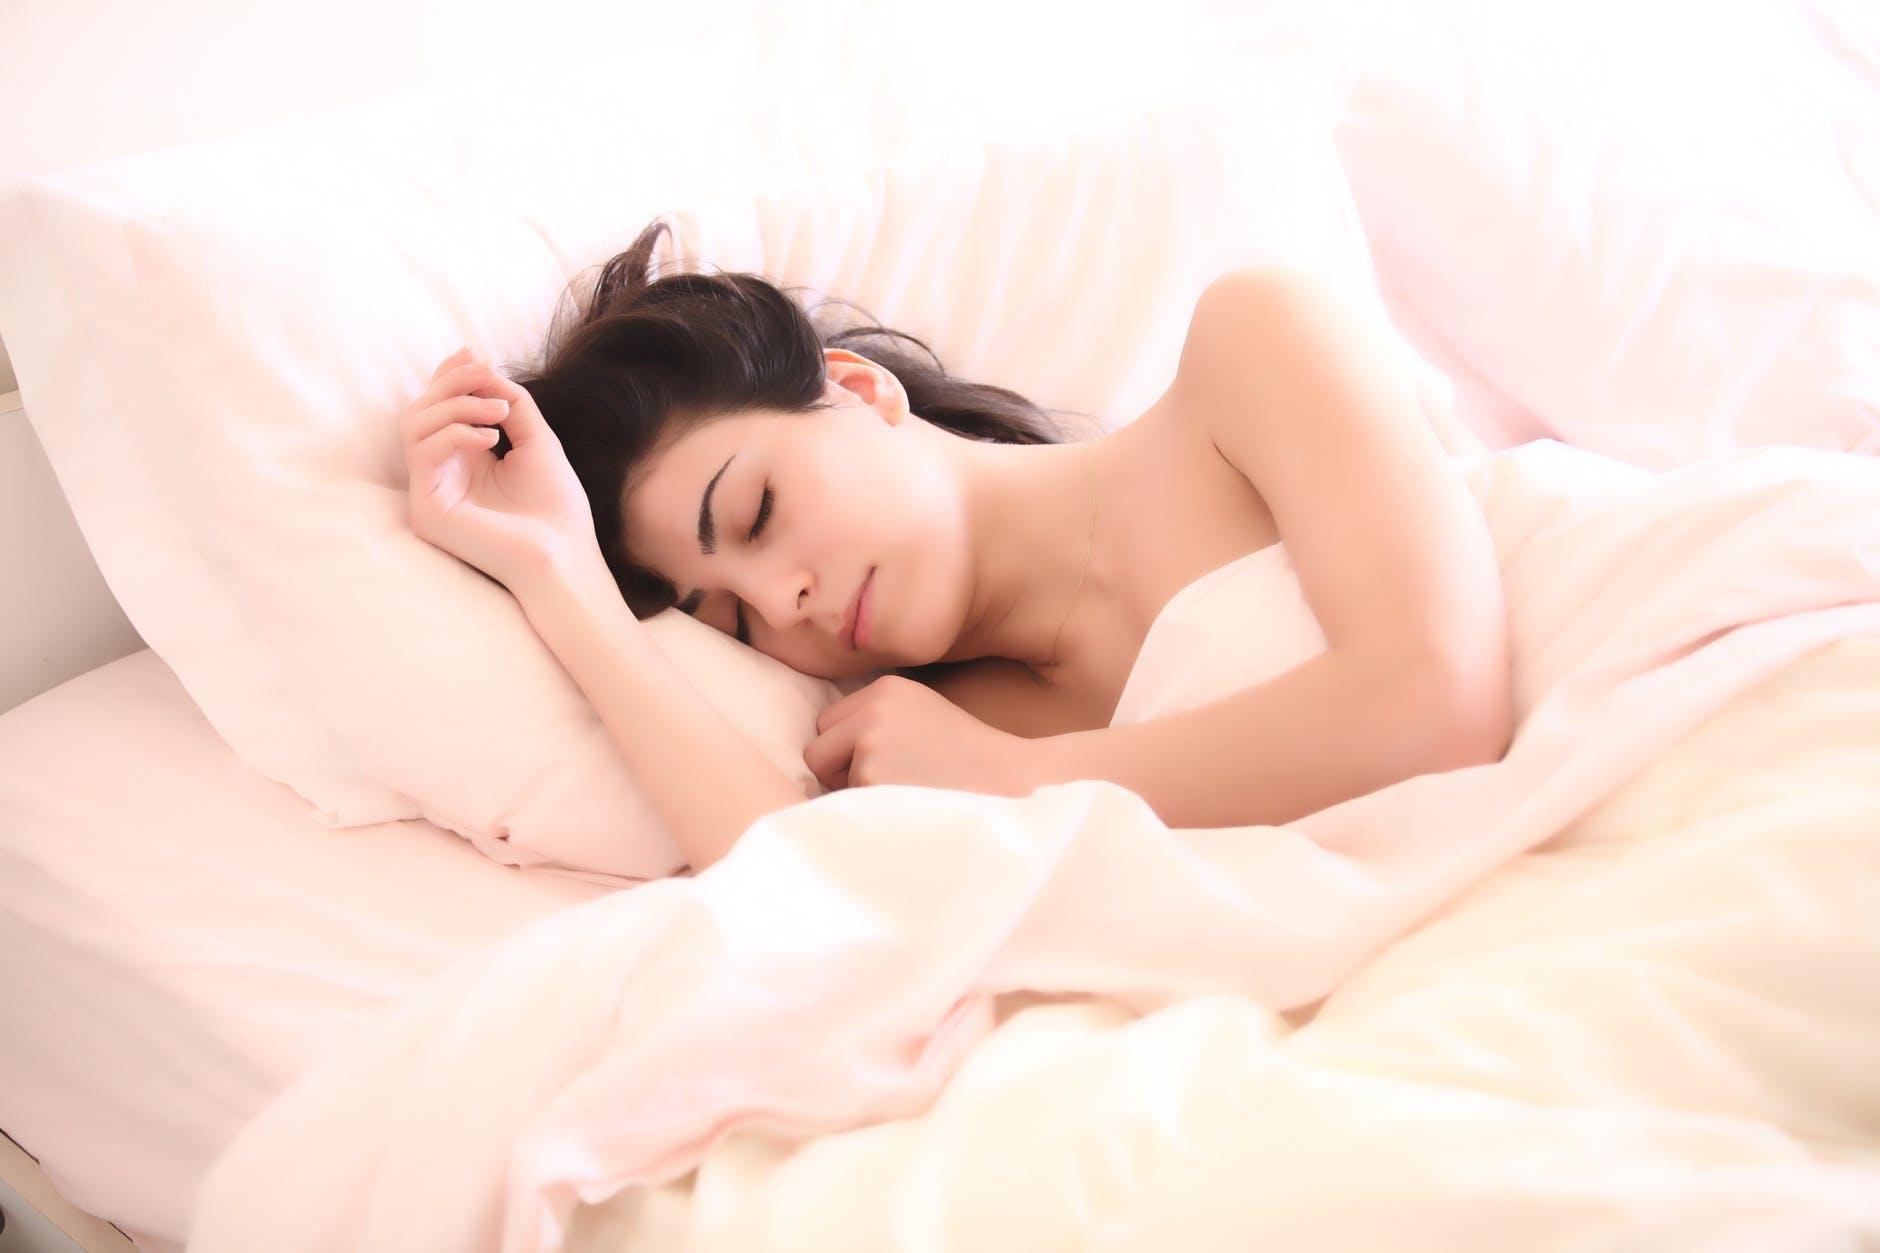 Sleeping Positon 2